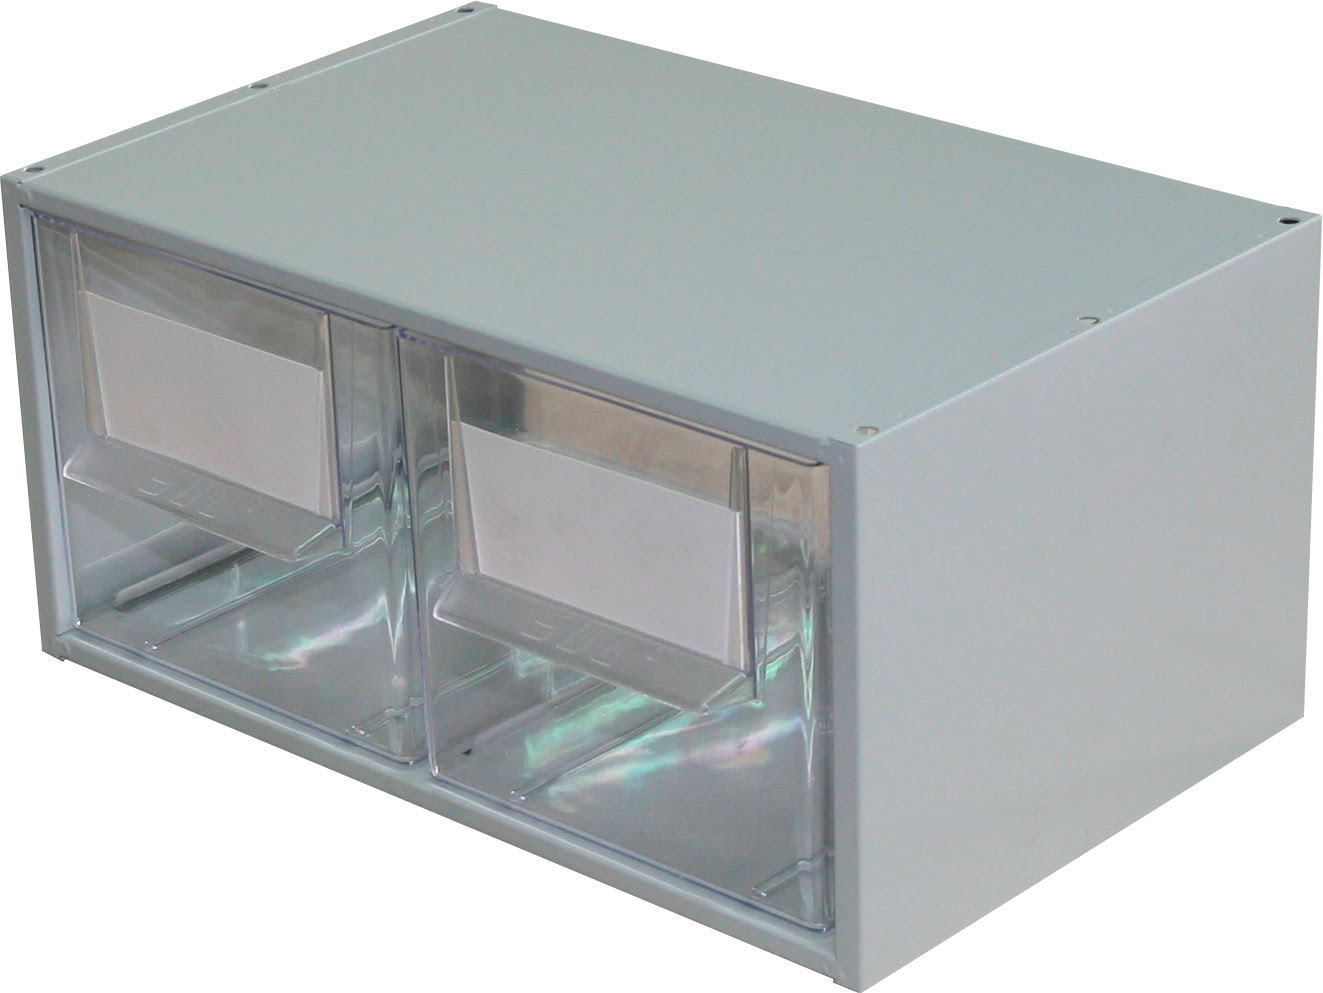 Estante Metálo-Plástica com 2 gavetas n.º 8 SUC